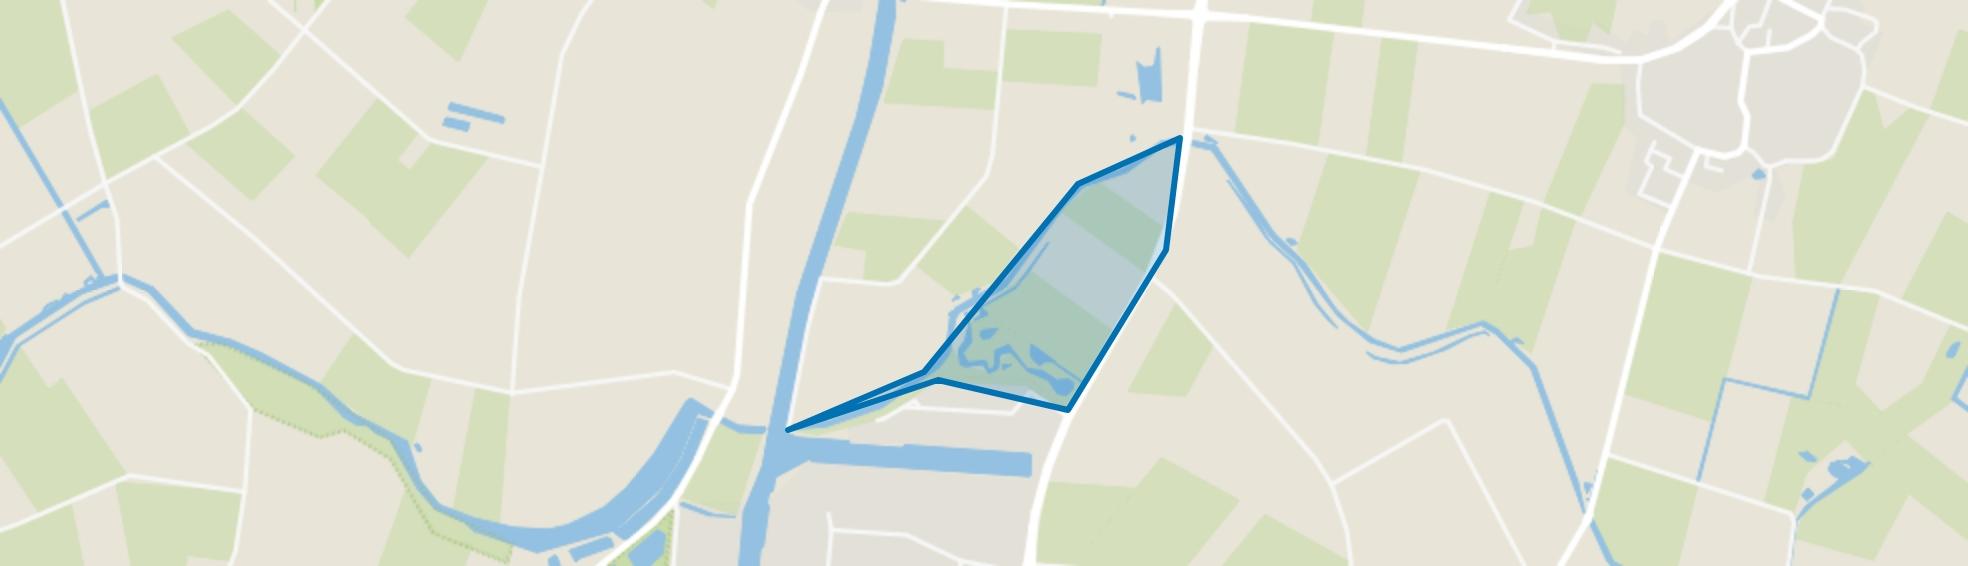 De Winkel, Oss map